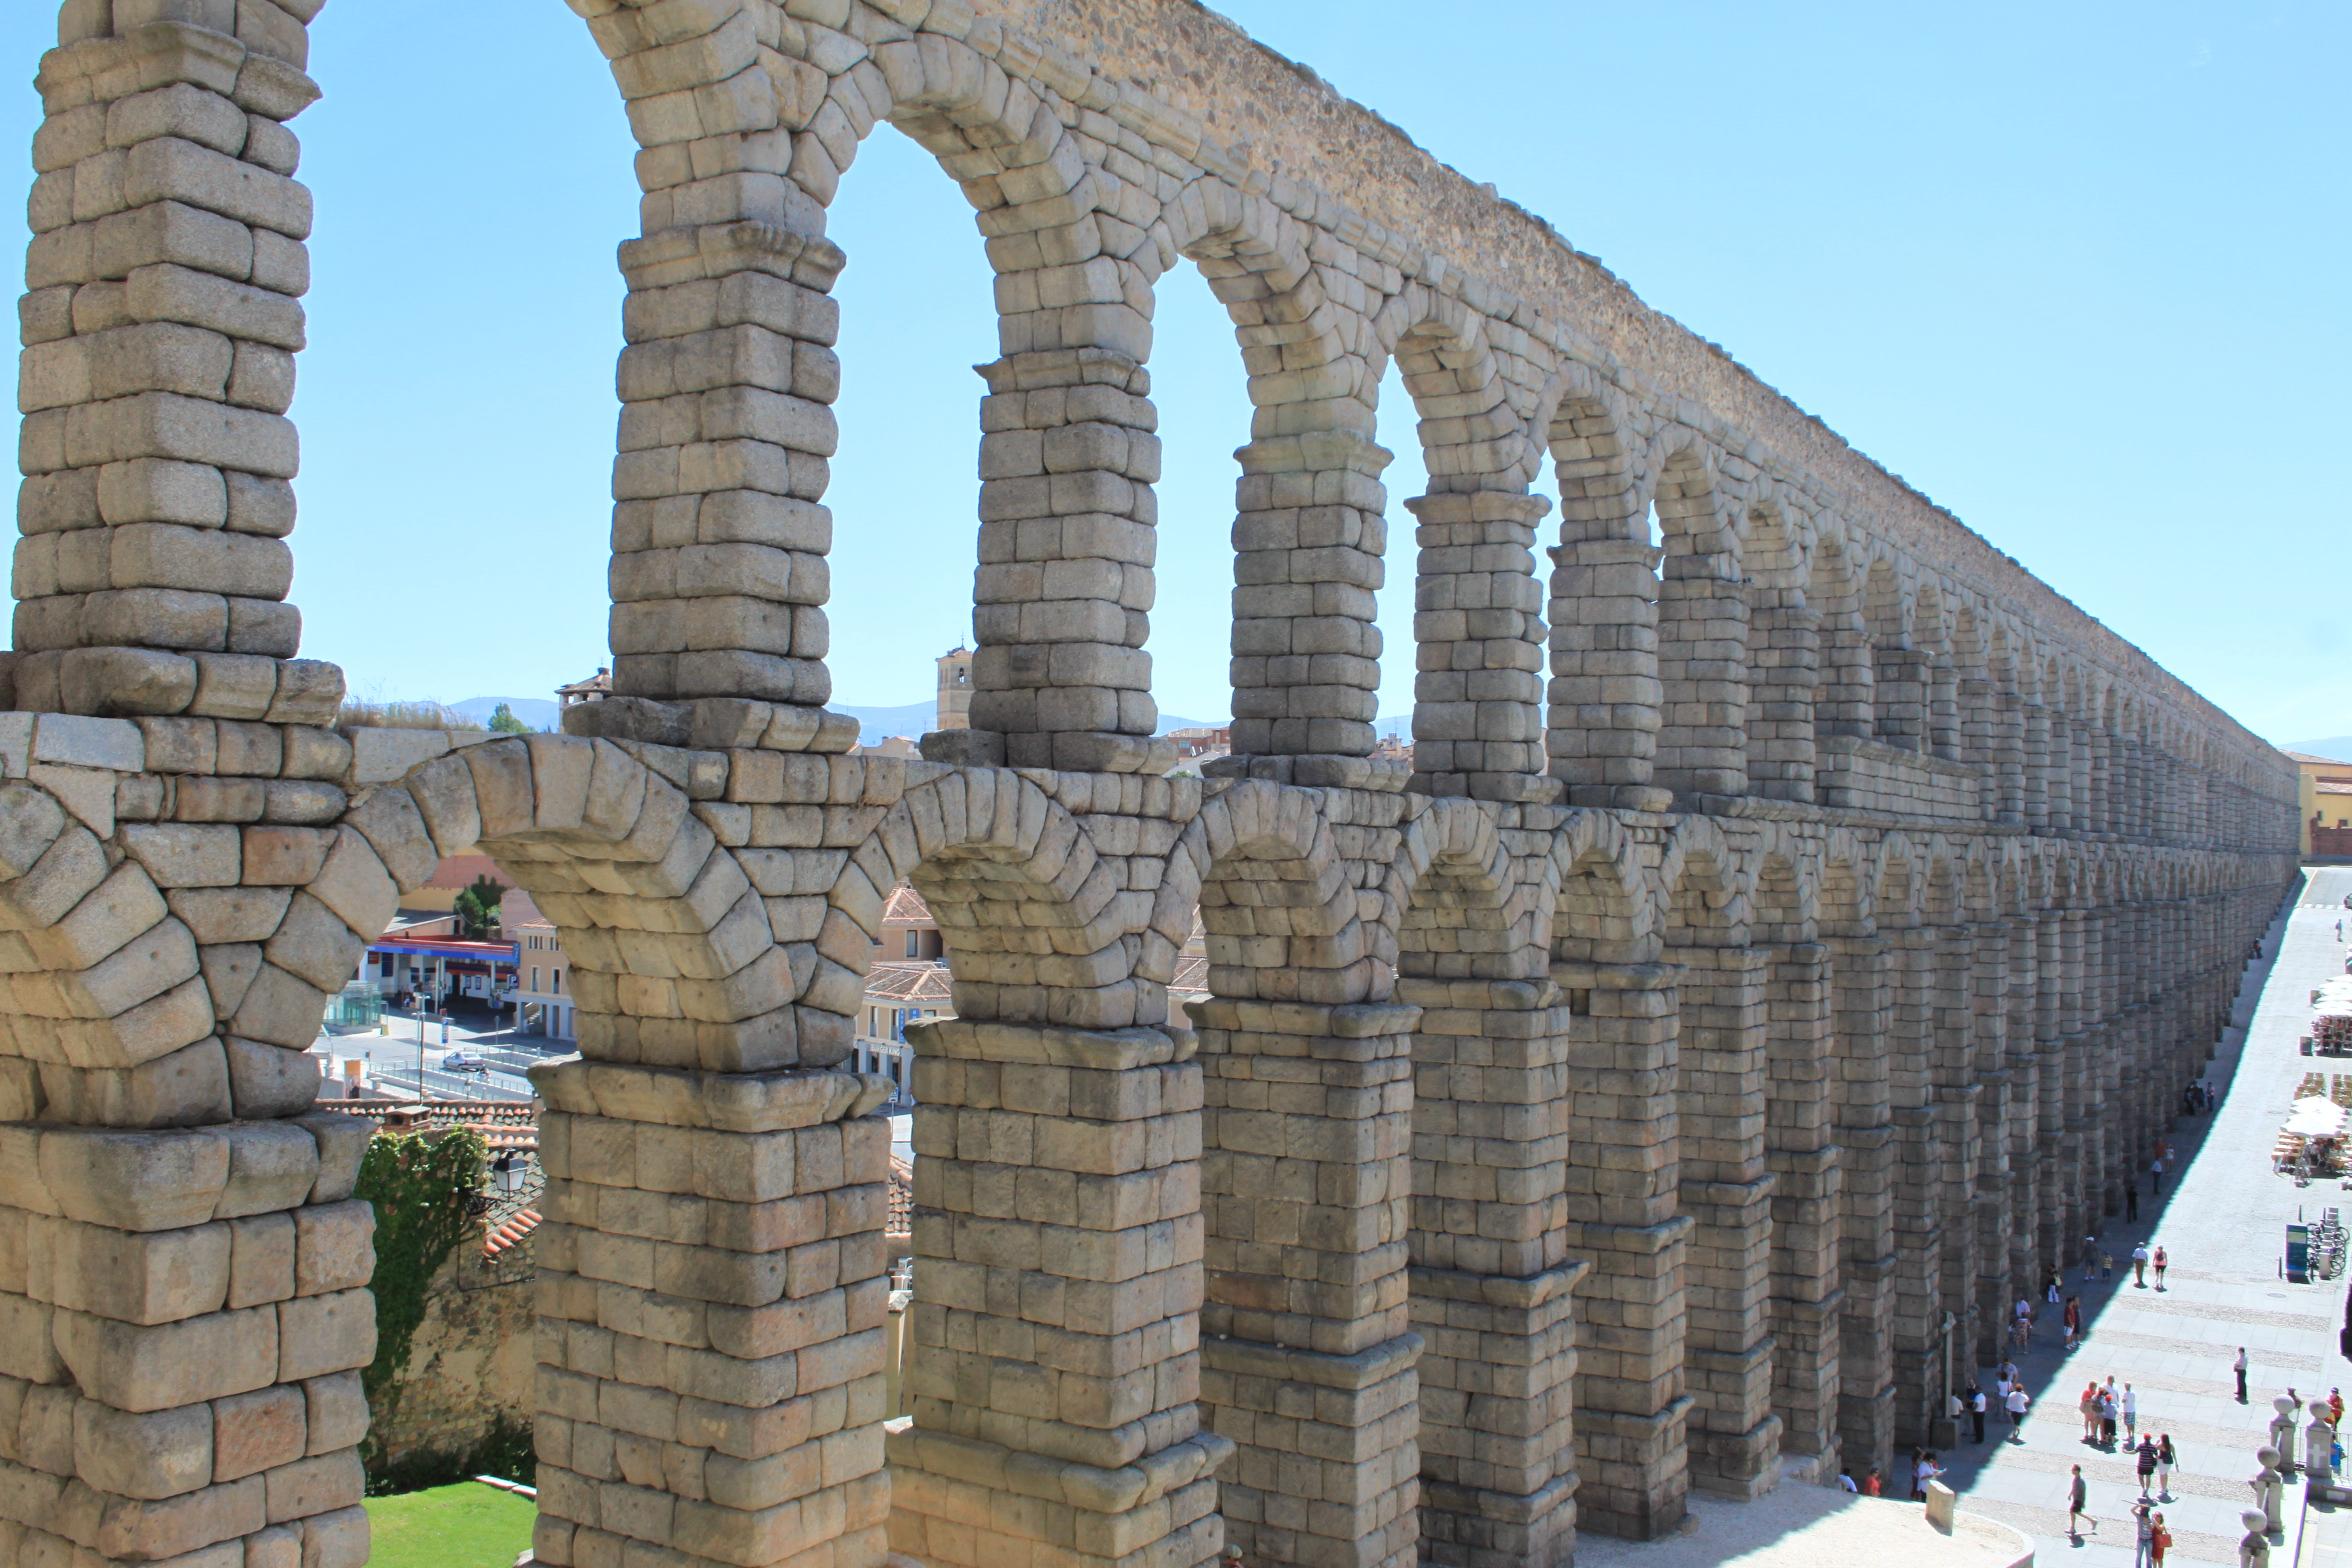 File:Acueducto de Segovia (6).JPG - Wikimedia Commons